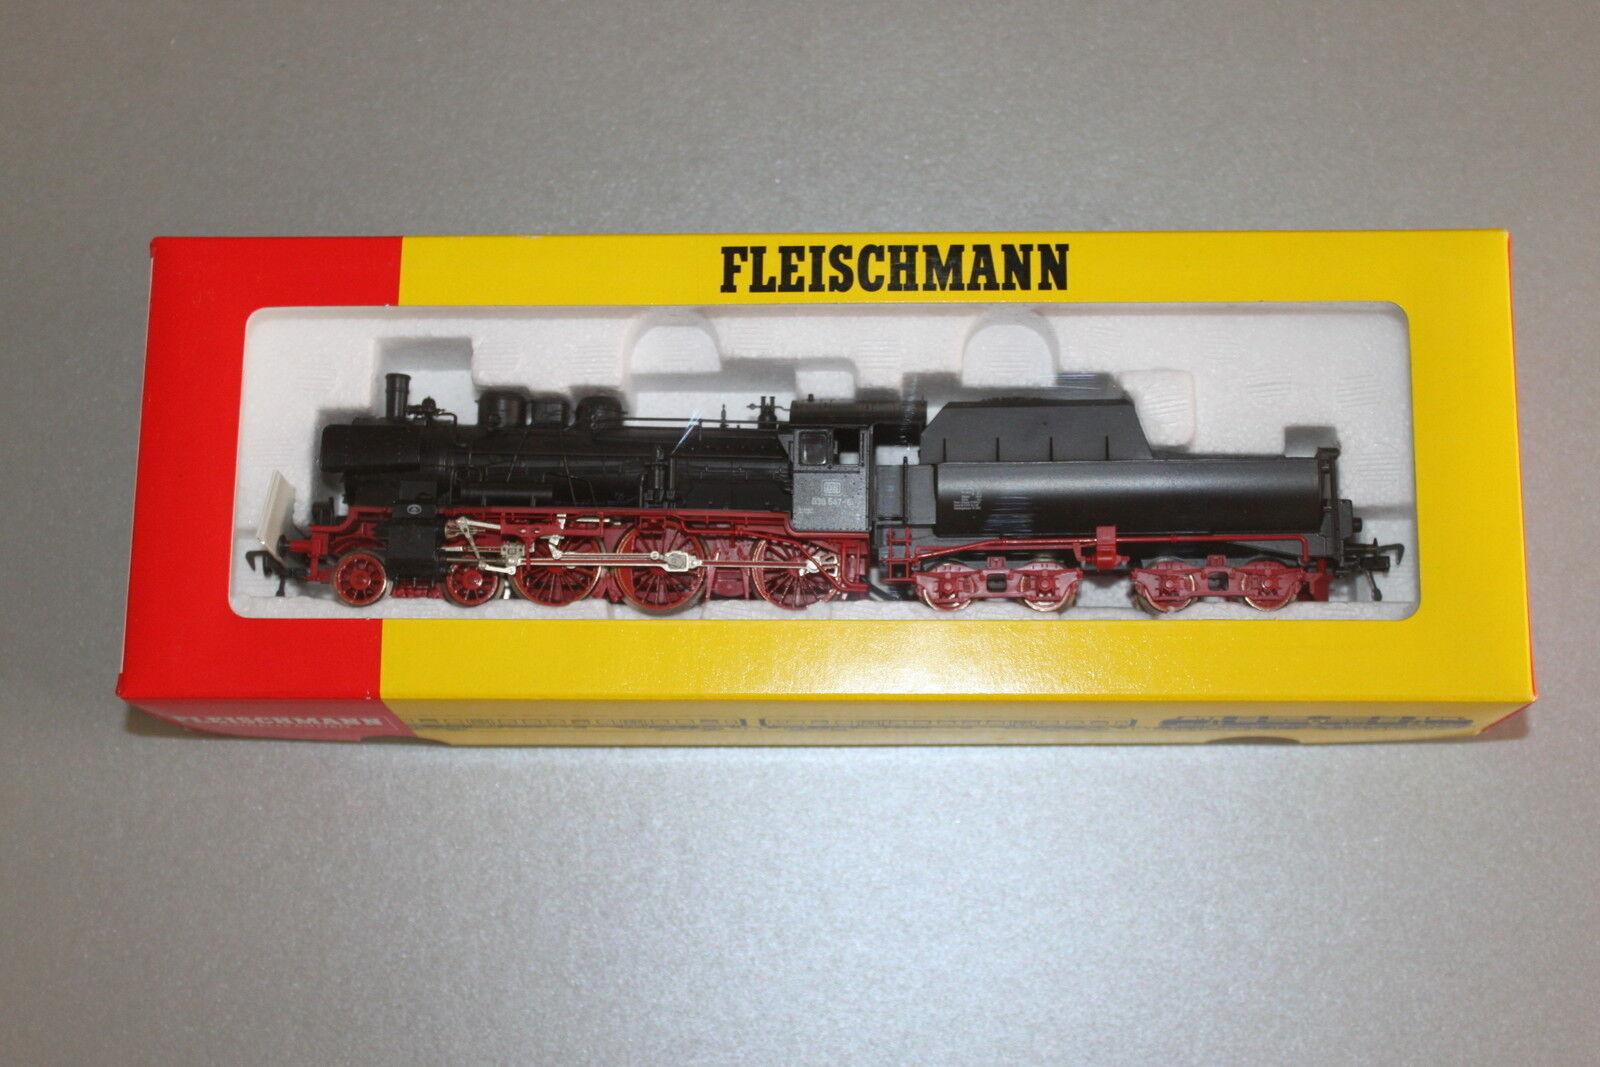 Fleischmann 4162 máquina de vapor serie 038 547-6 DB pista h0 OVP